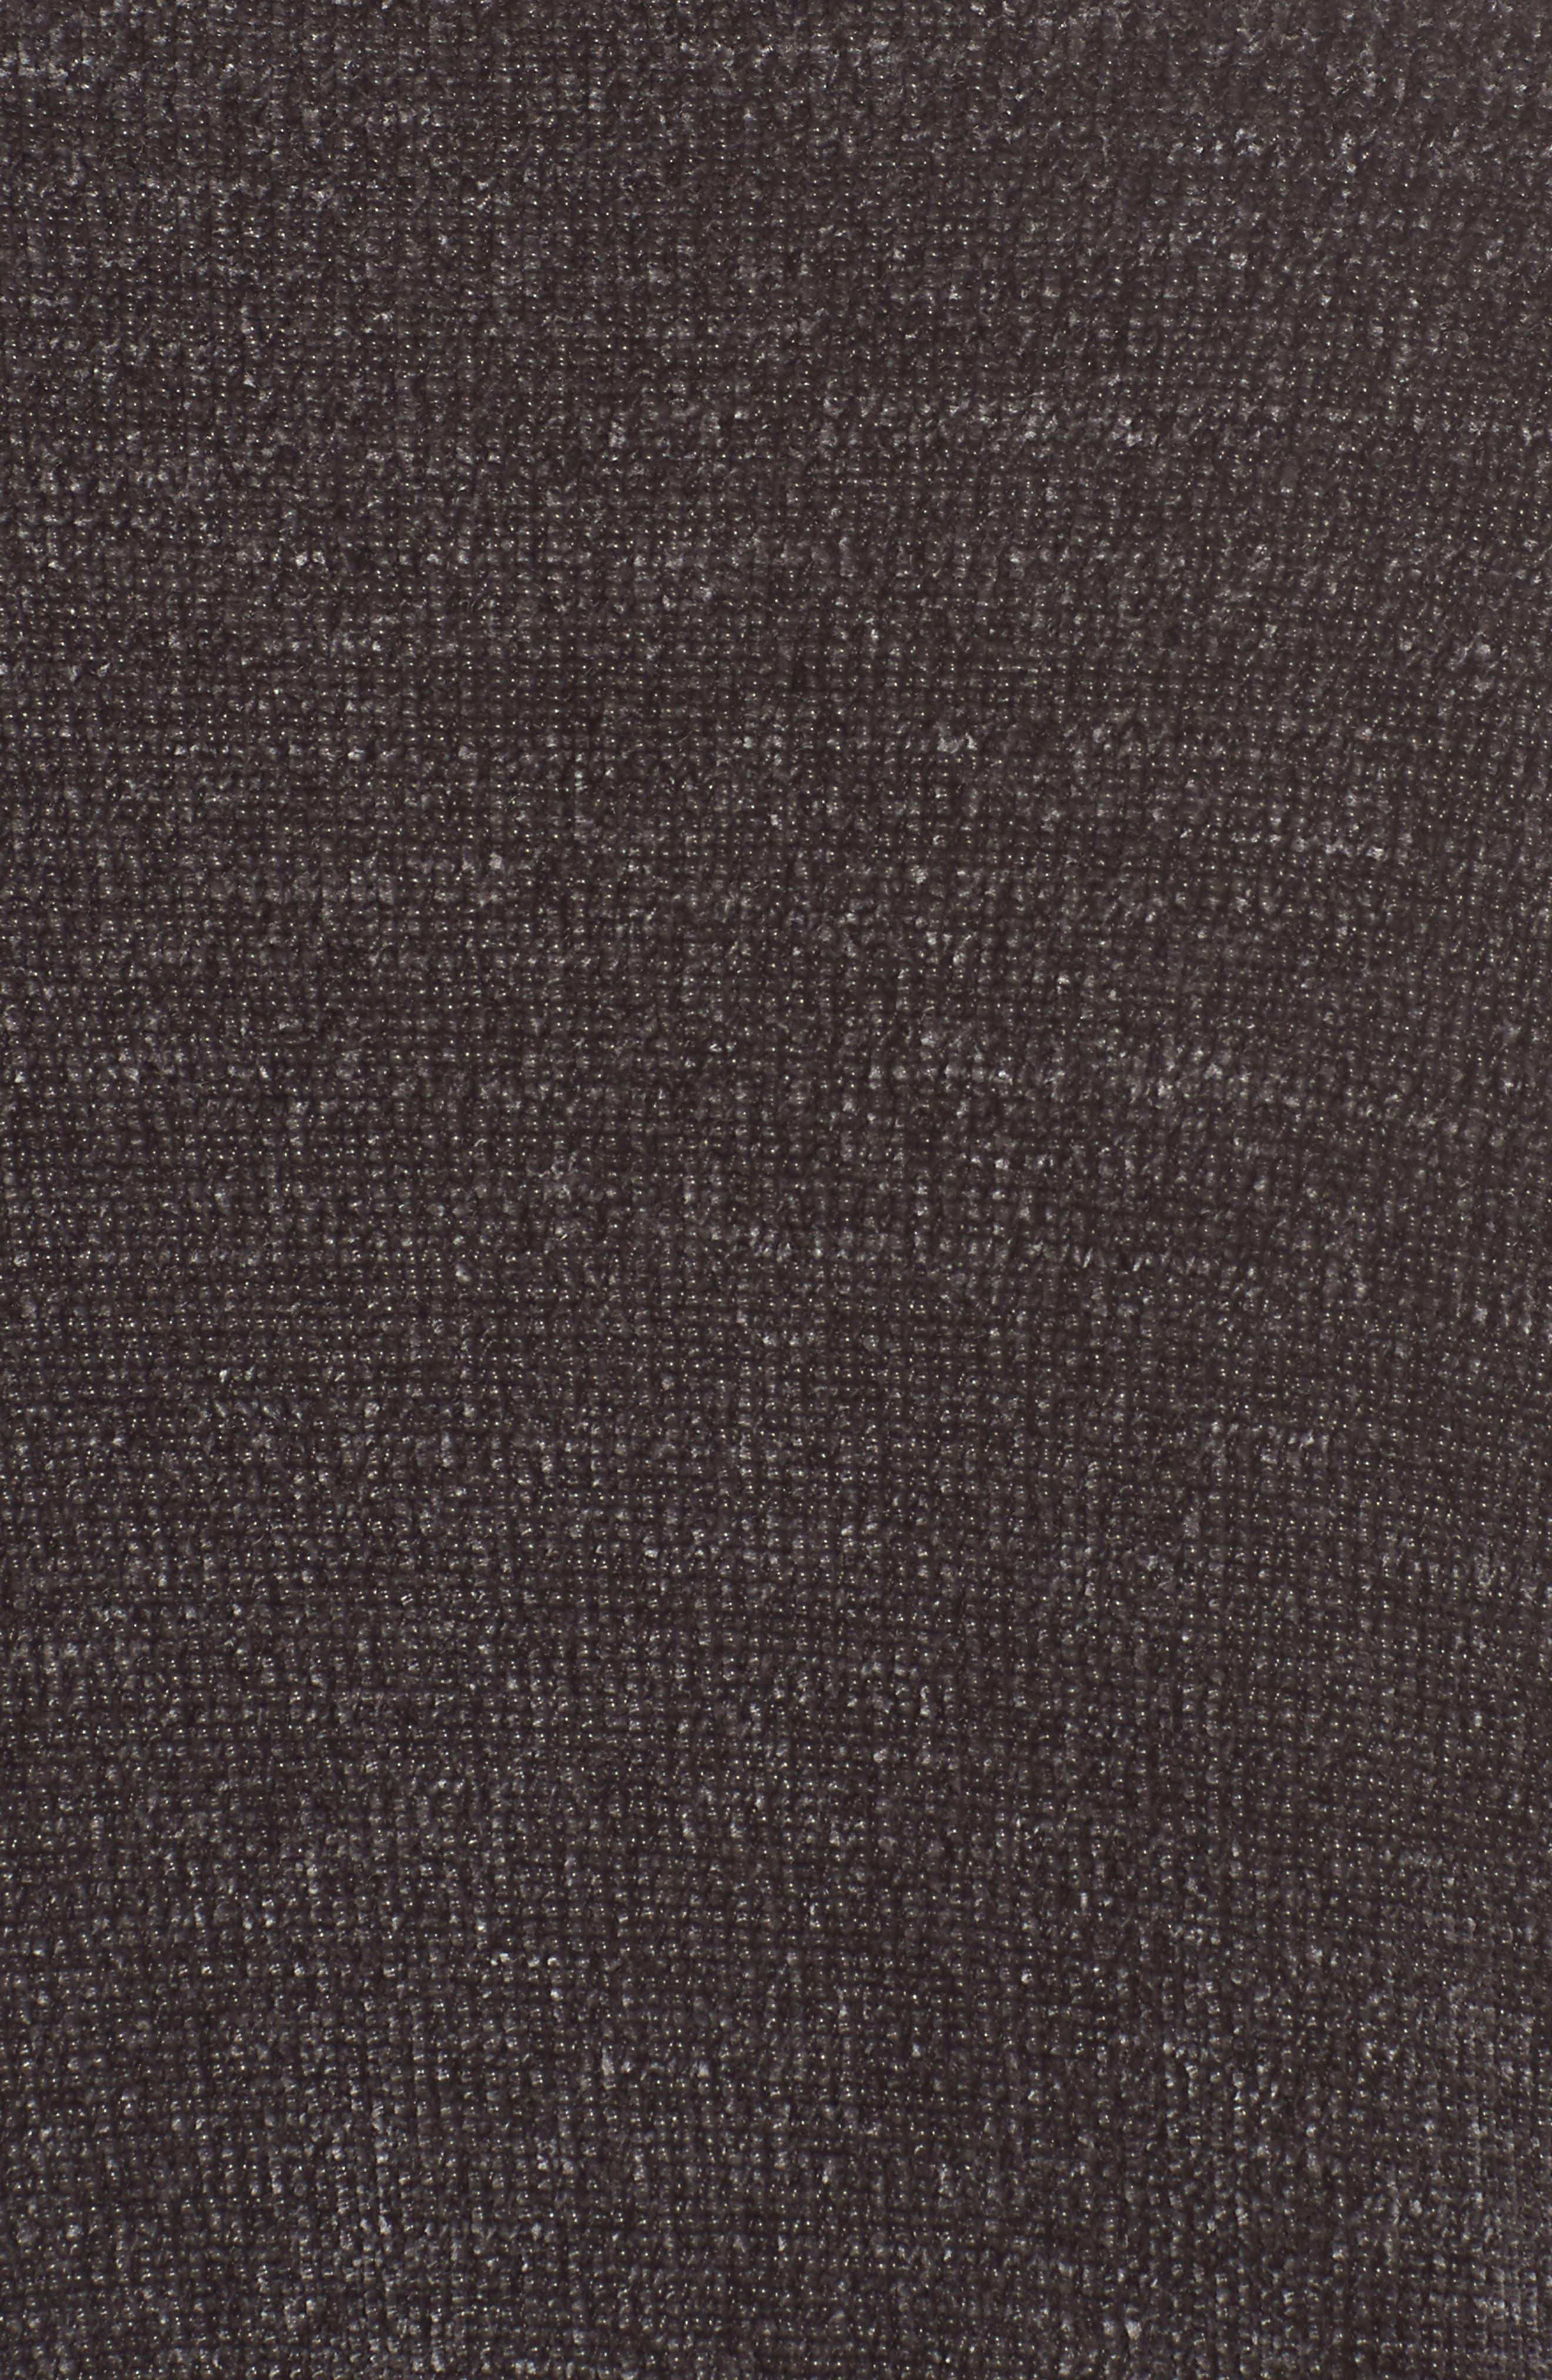 Scallop Hem Sweater,                             Alternate thumbnail 5, color,                             021